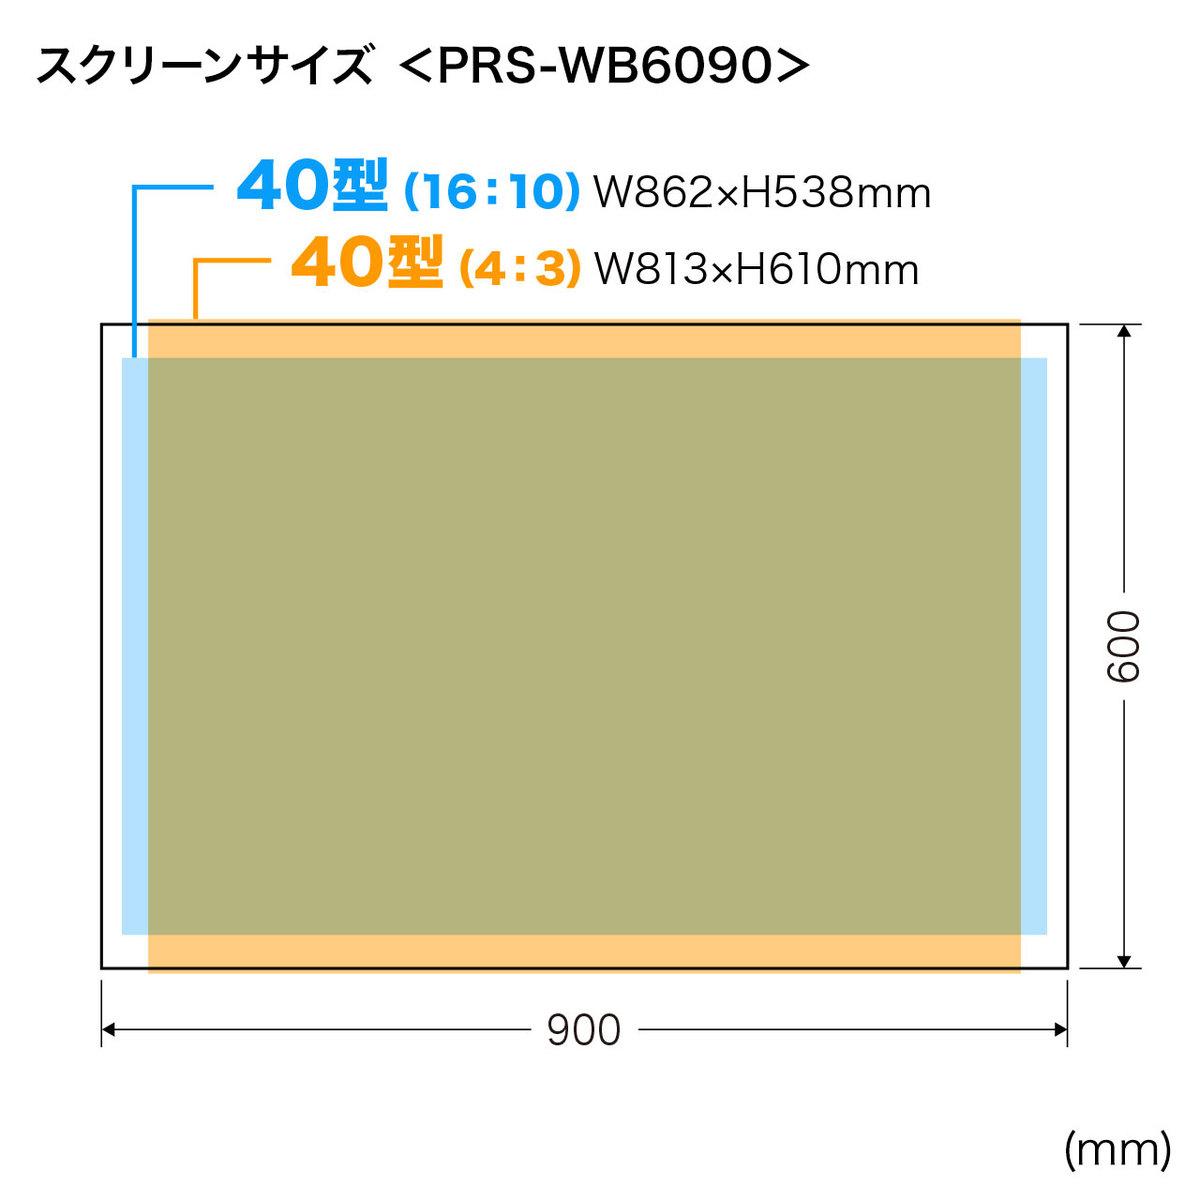 [PRS-WB6090] プロジェクタースクリーン(40型相当、マグネット式)